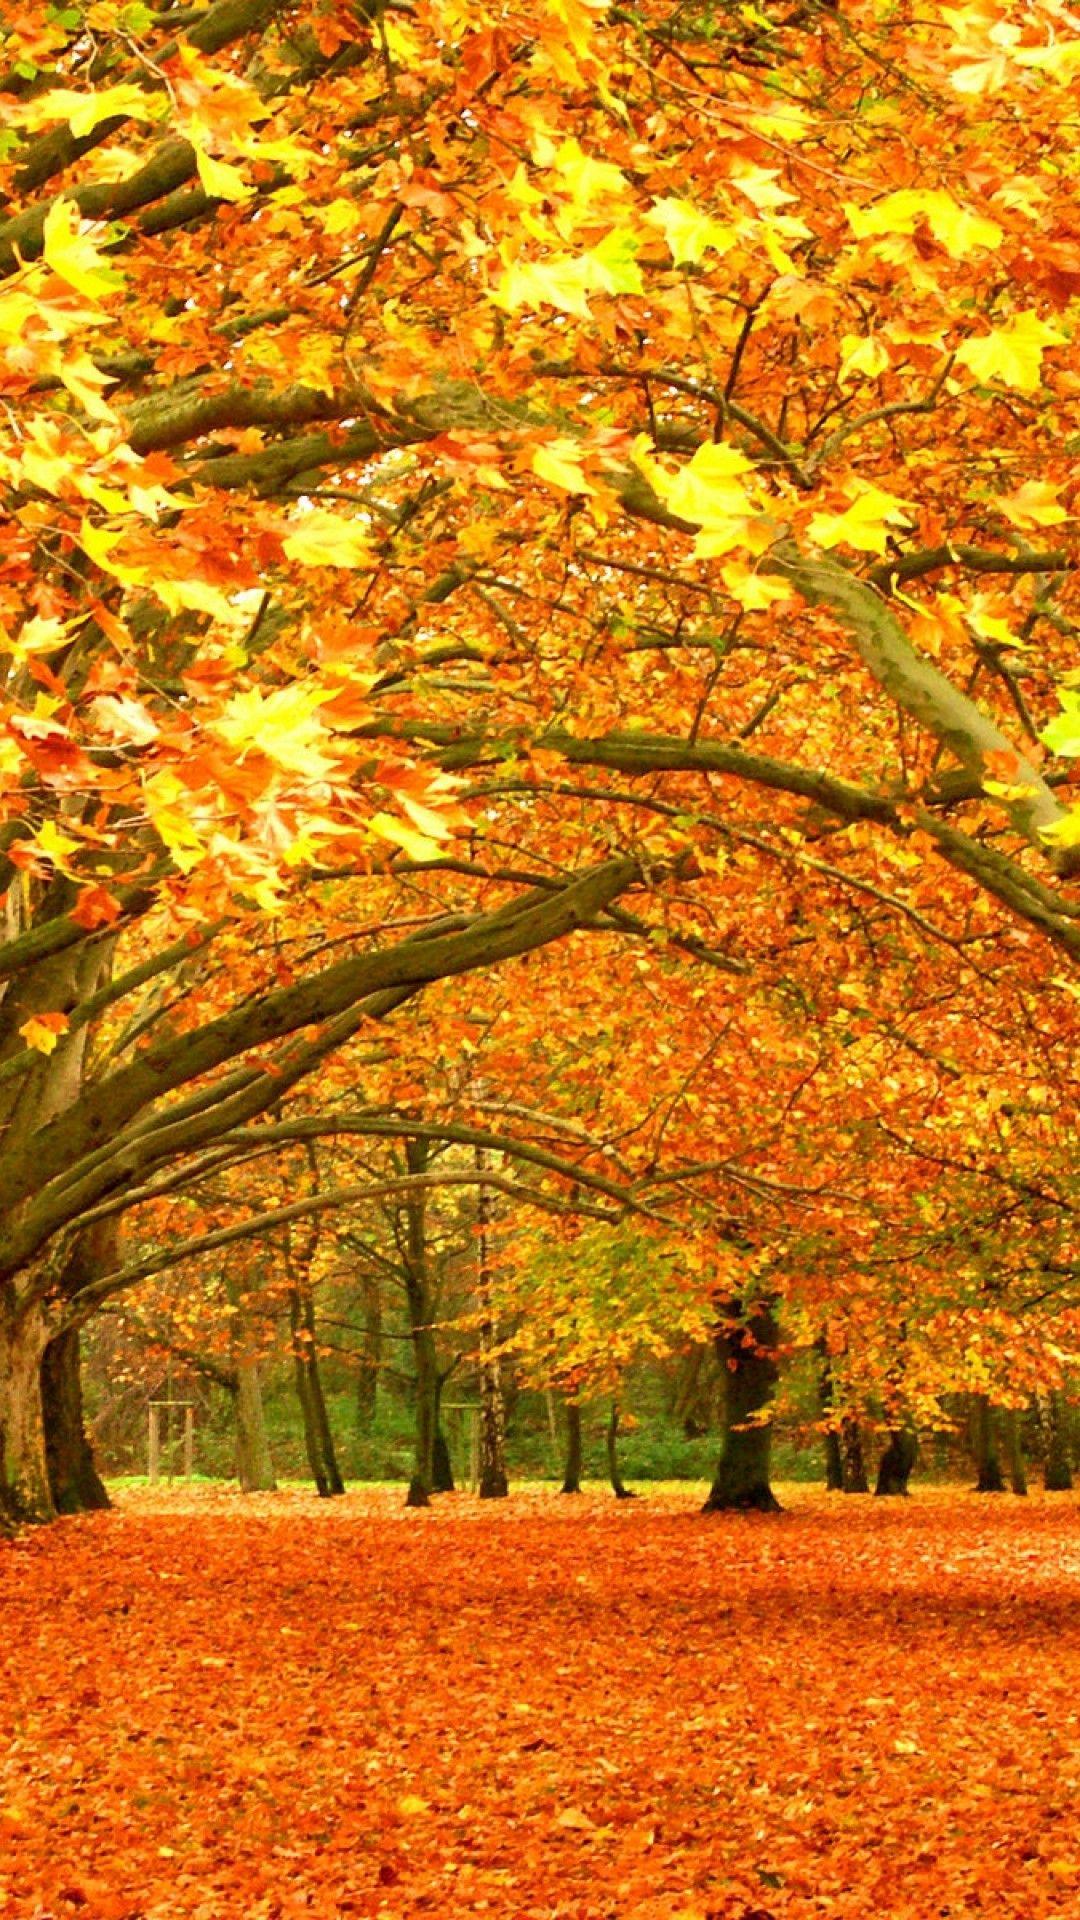 秋の森 秋 壁紙 紅葉 景色 綺麗な風景